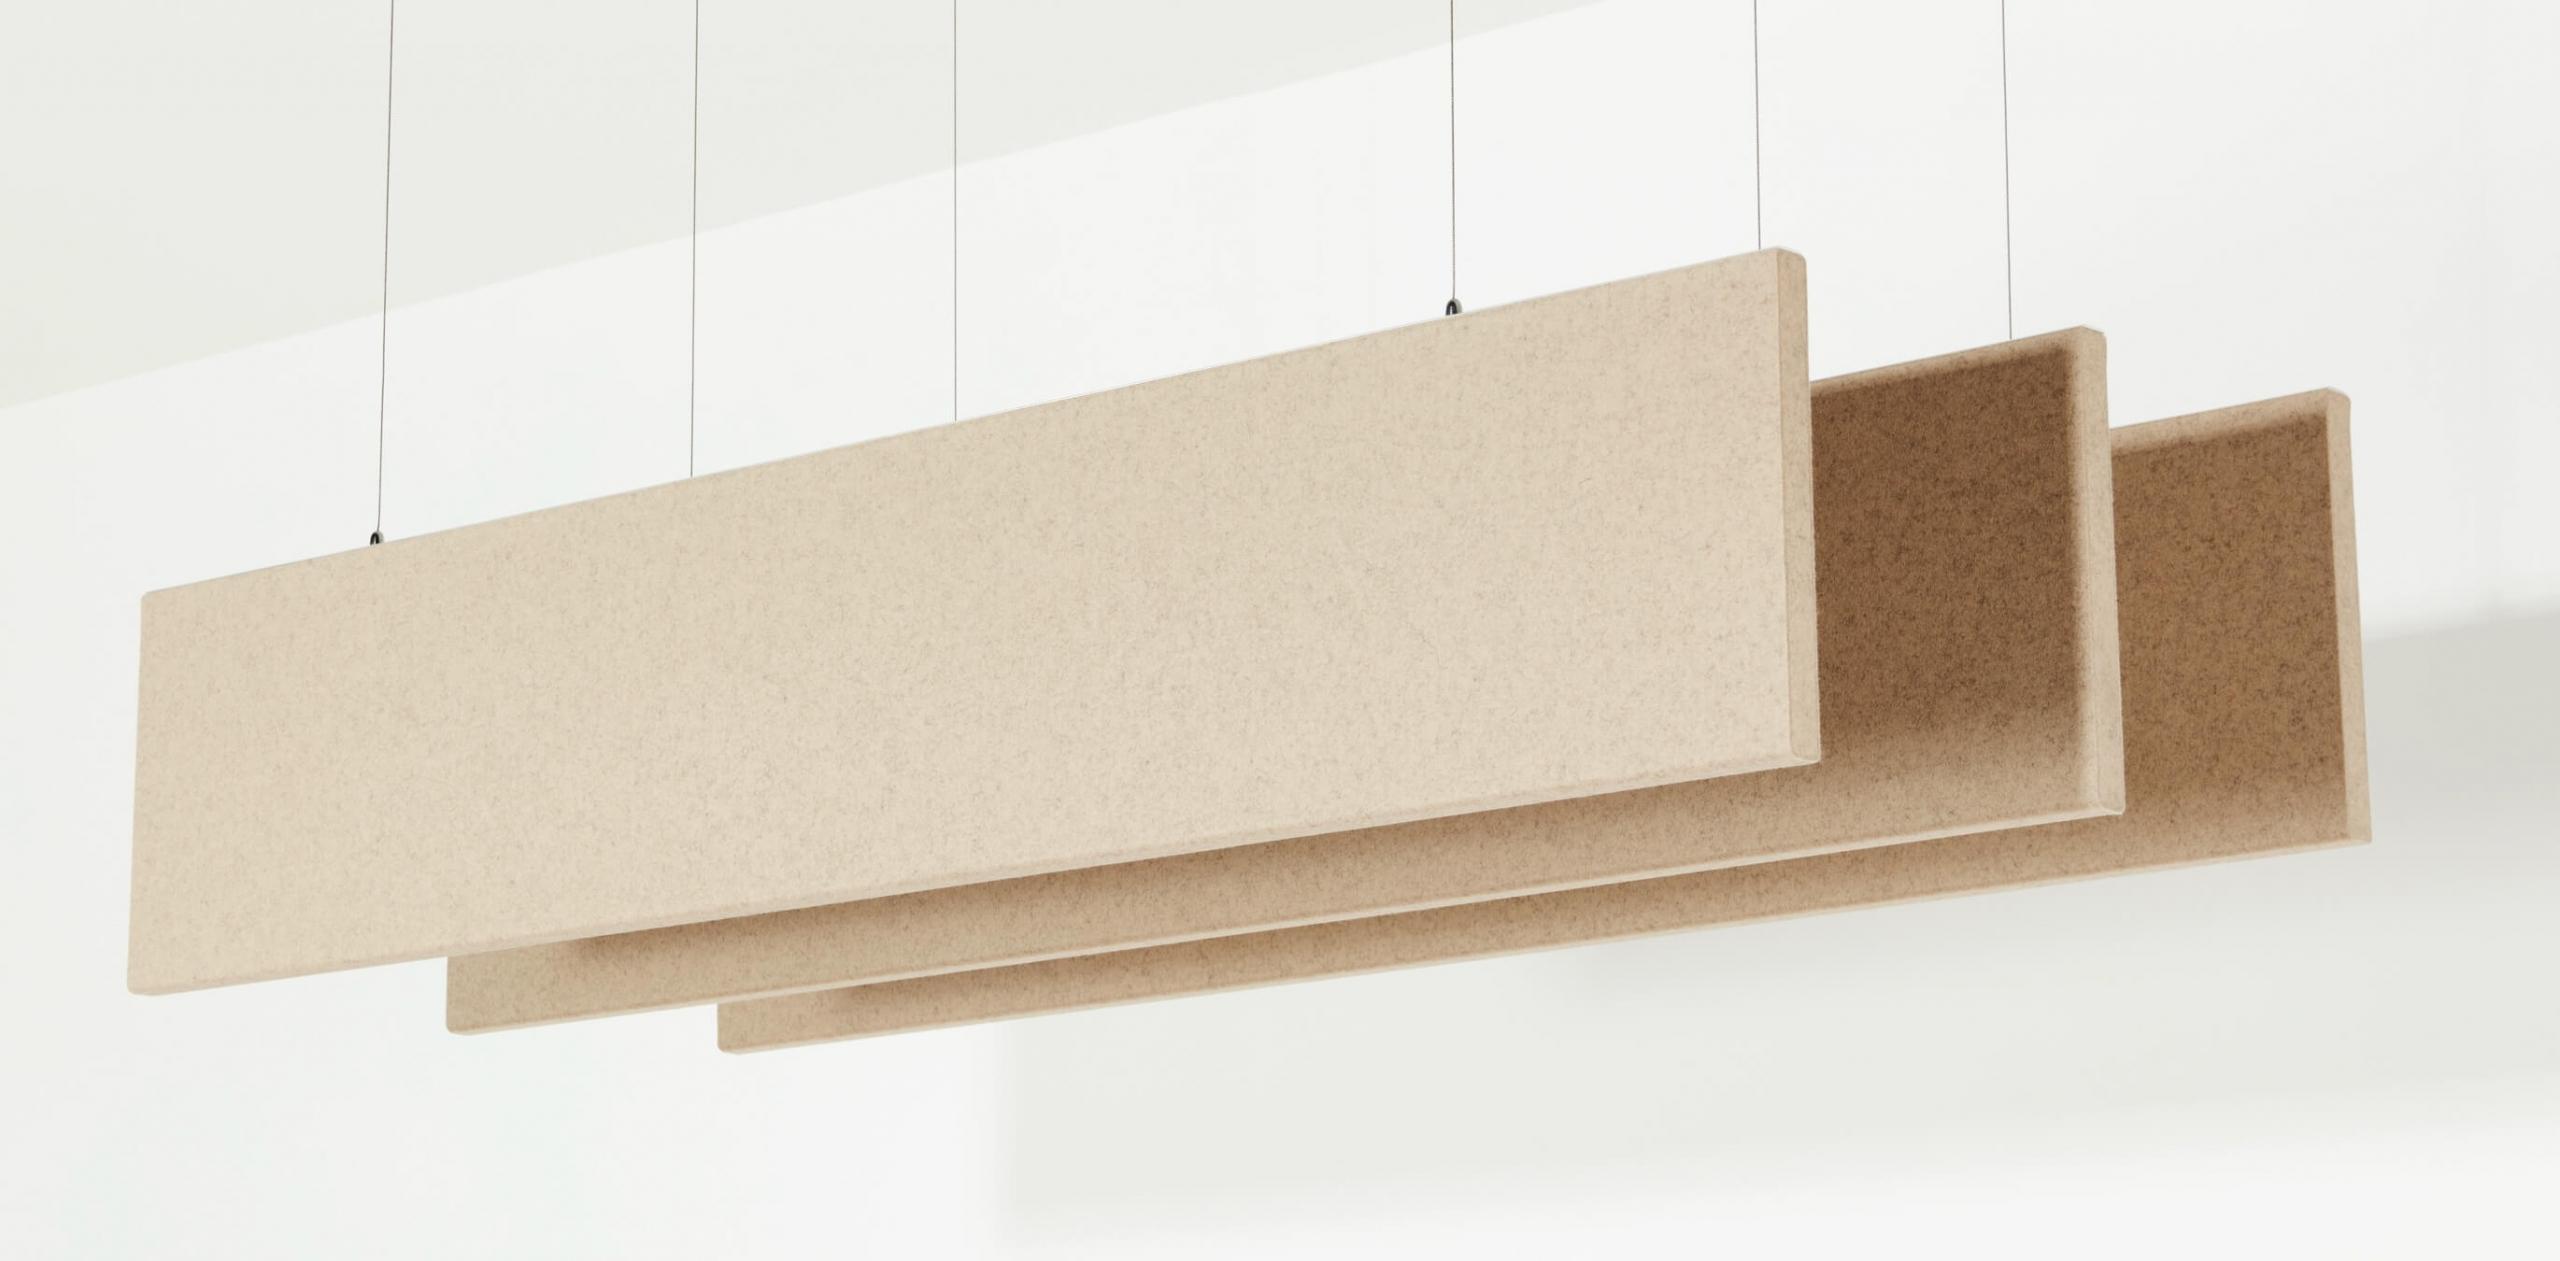 Display of 3 hanging linear baffles made of felt.